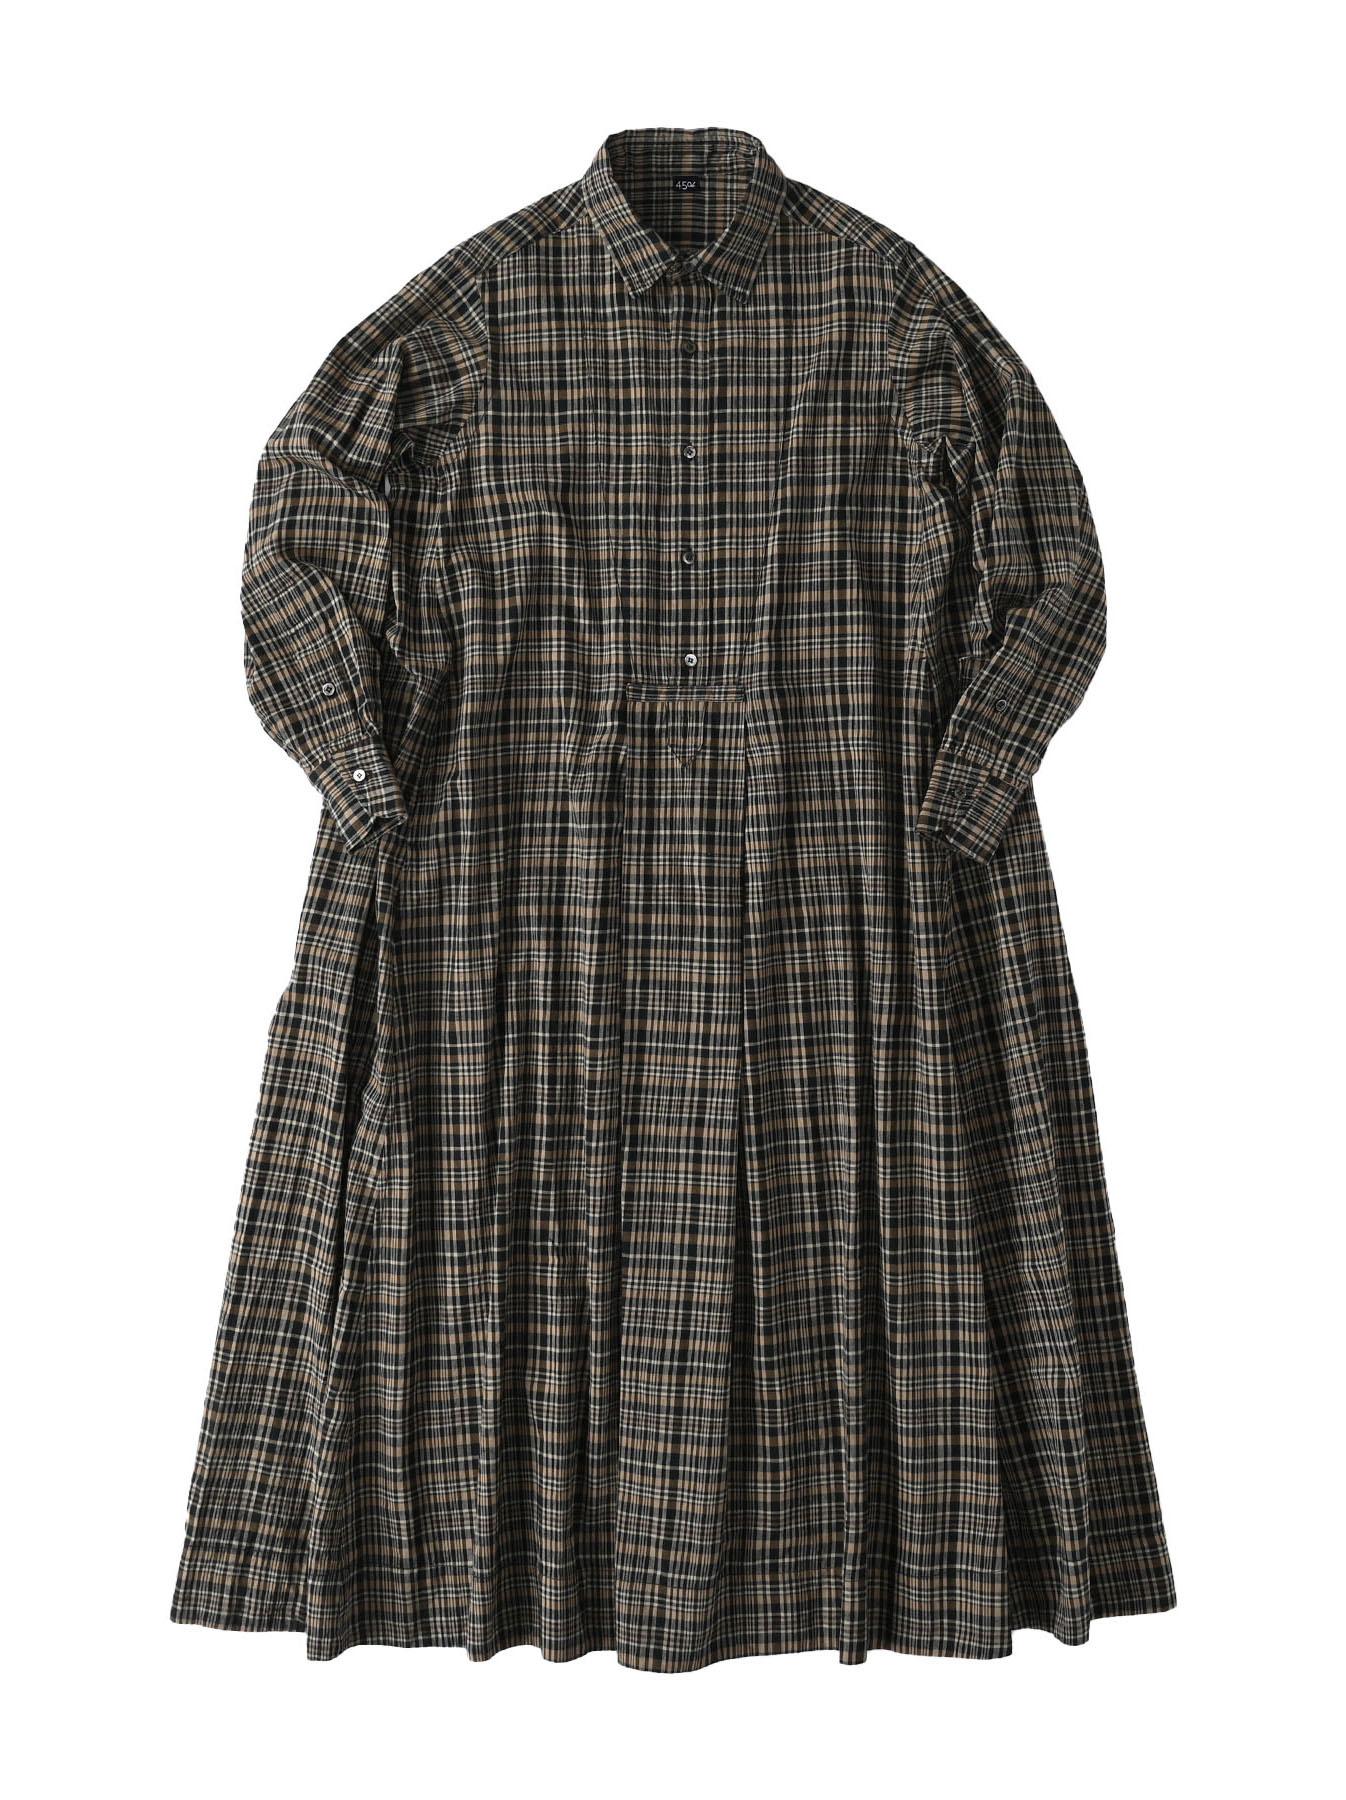 Indian Mugi-hira Dress (0421)-1